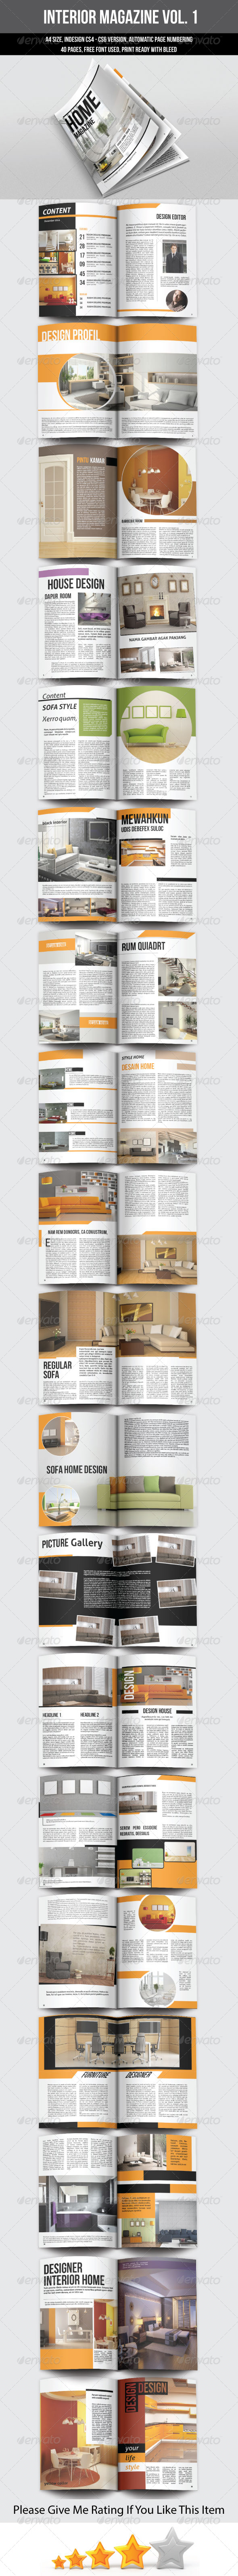 A5 Portrait Interior Magazine Template - Magazines Print Templates